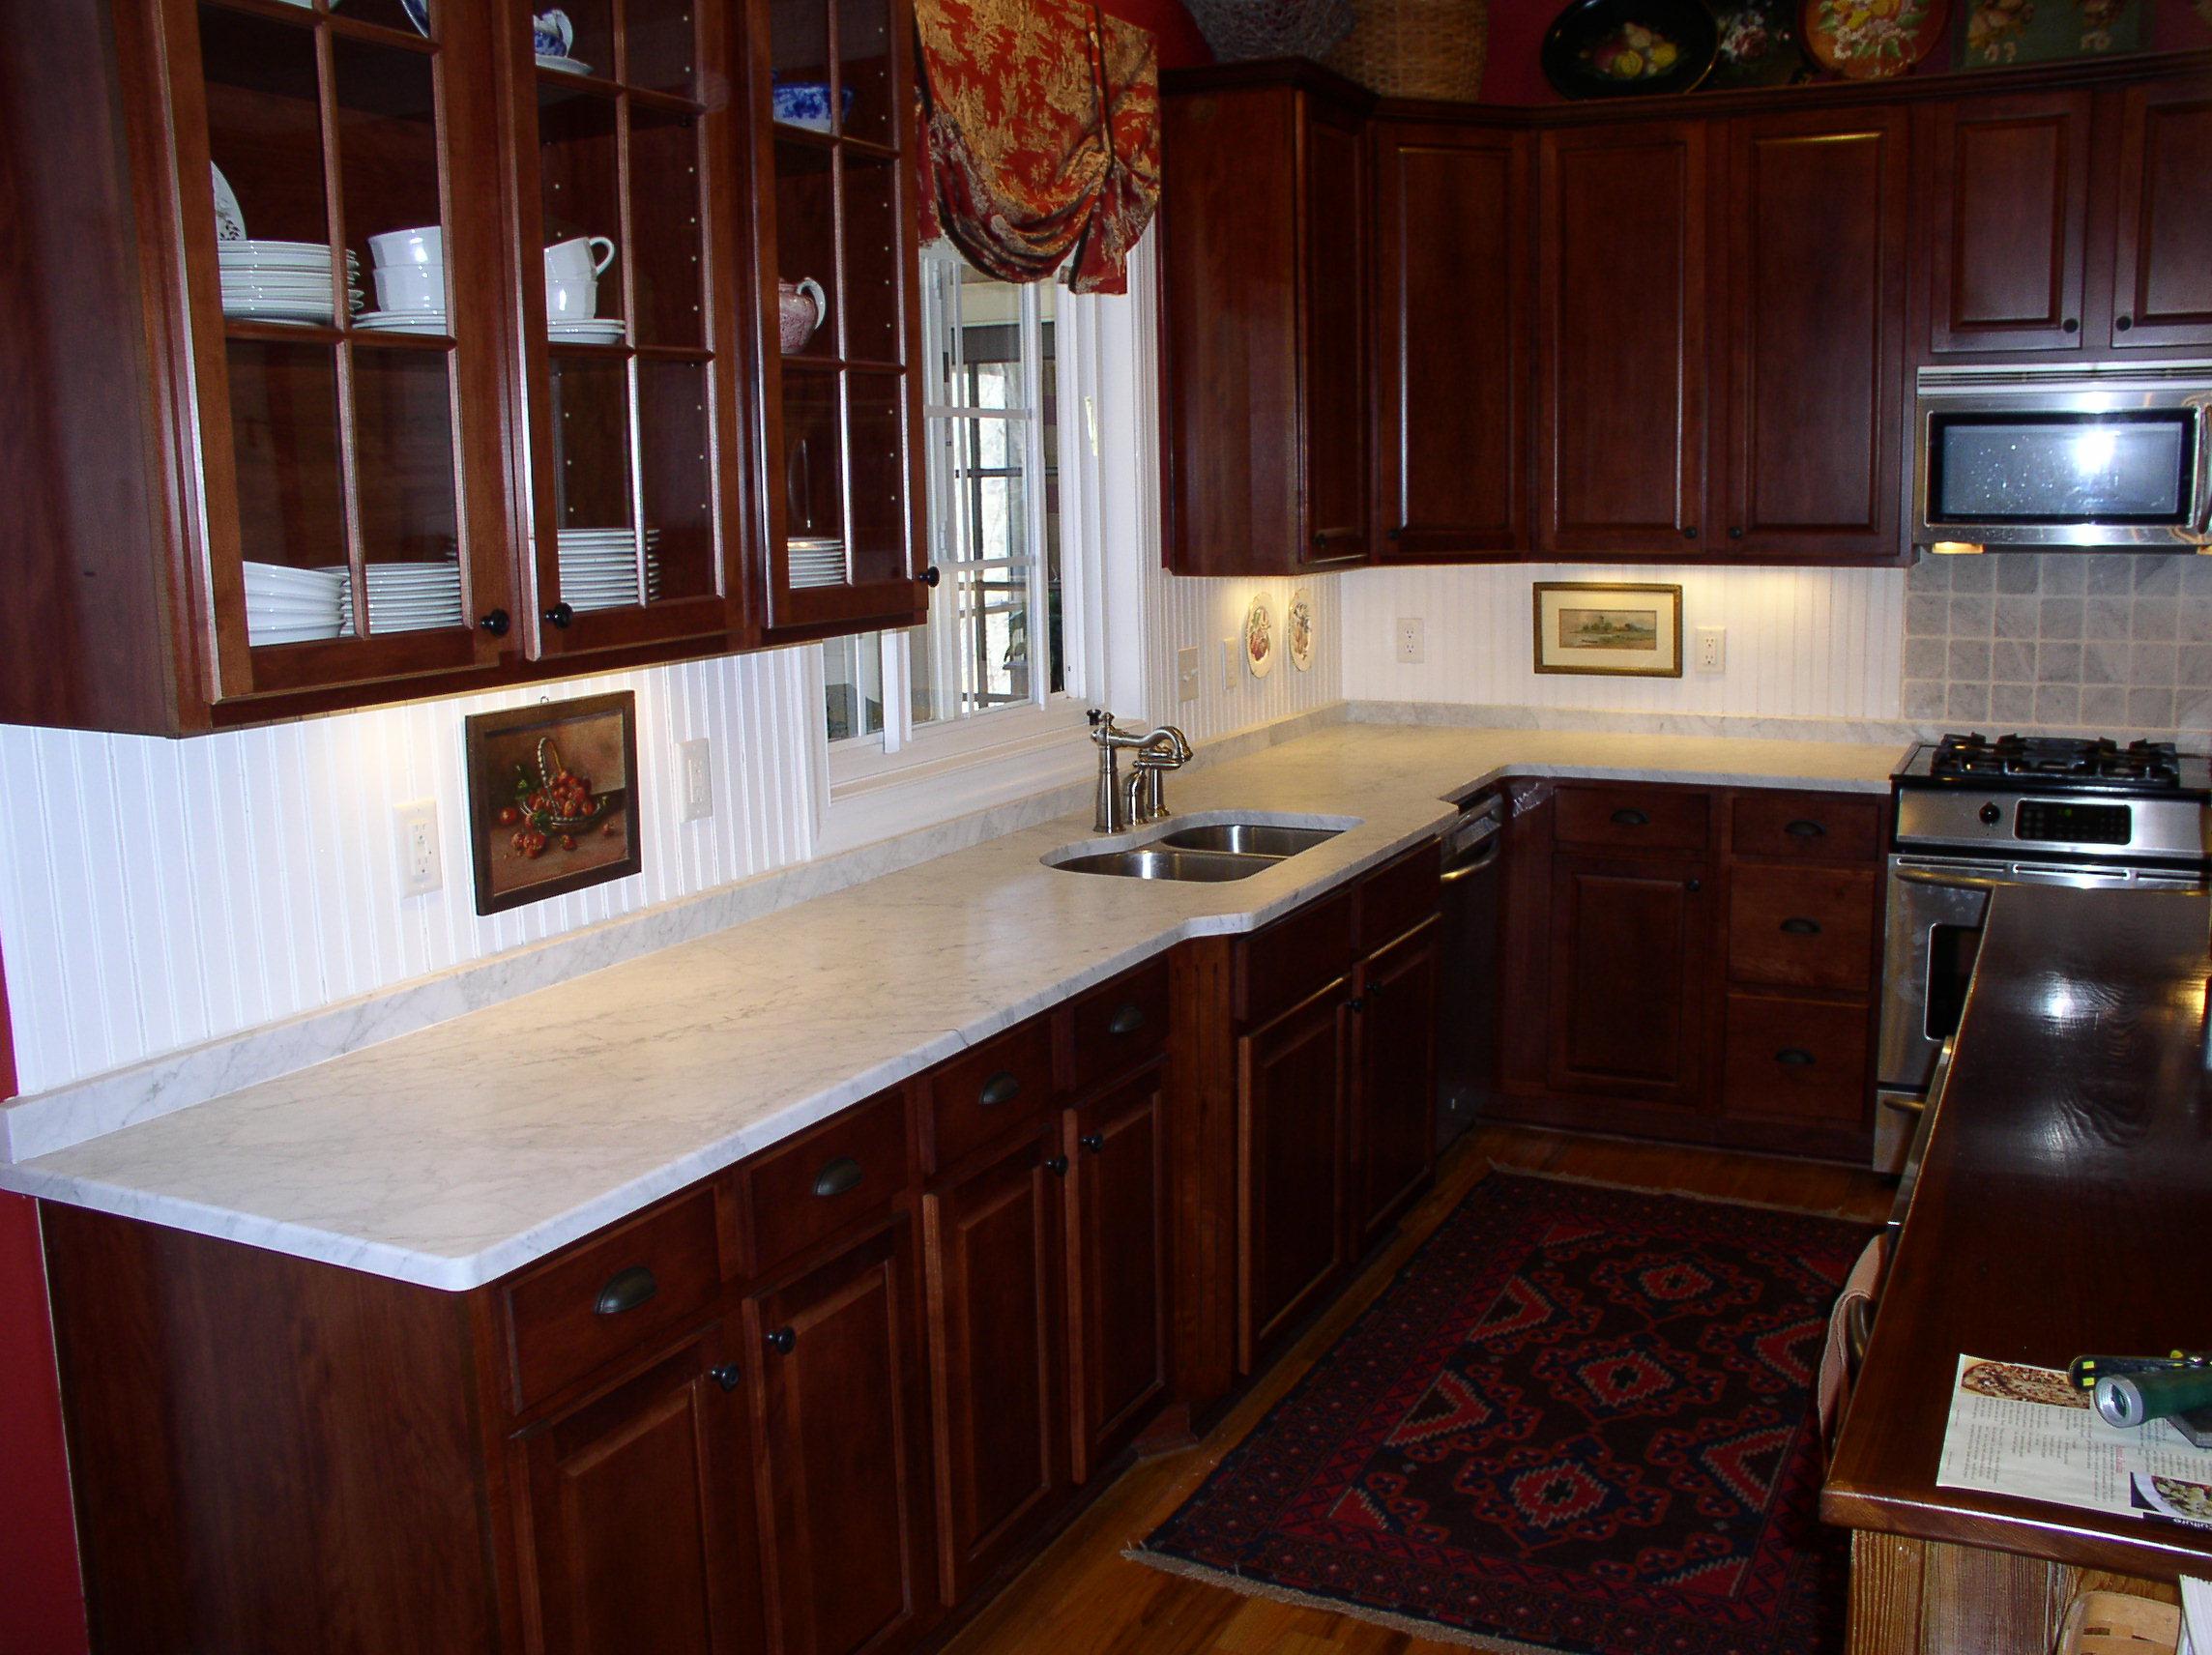 White Carrara Honed Fayetteville Granite Countertop